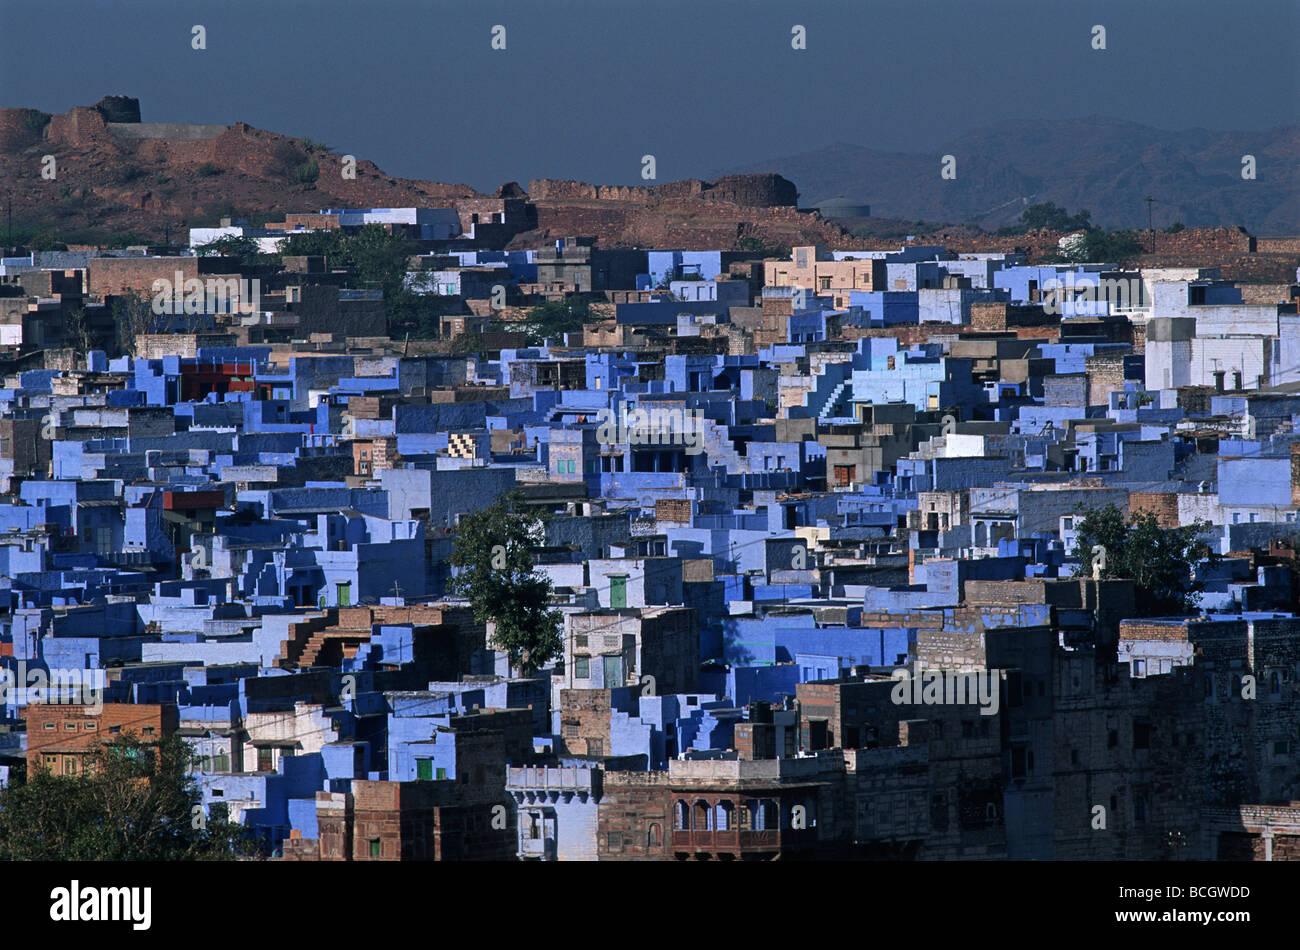 Inde Rajasthan Jodhpur la ville bleue Banque D'Images